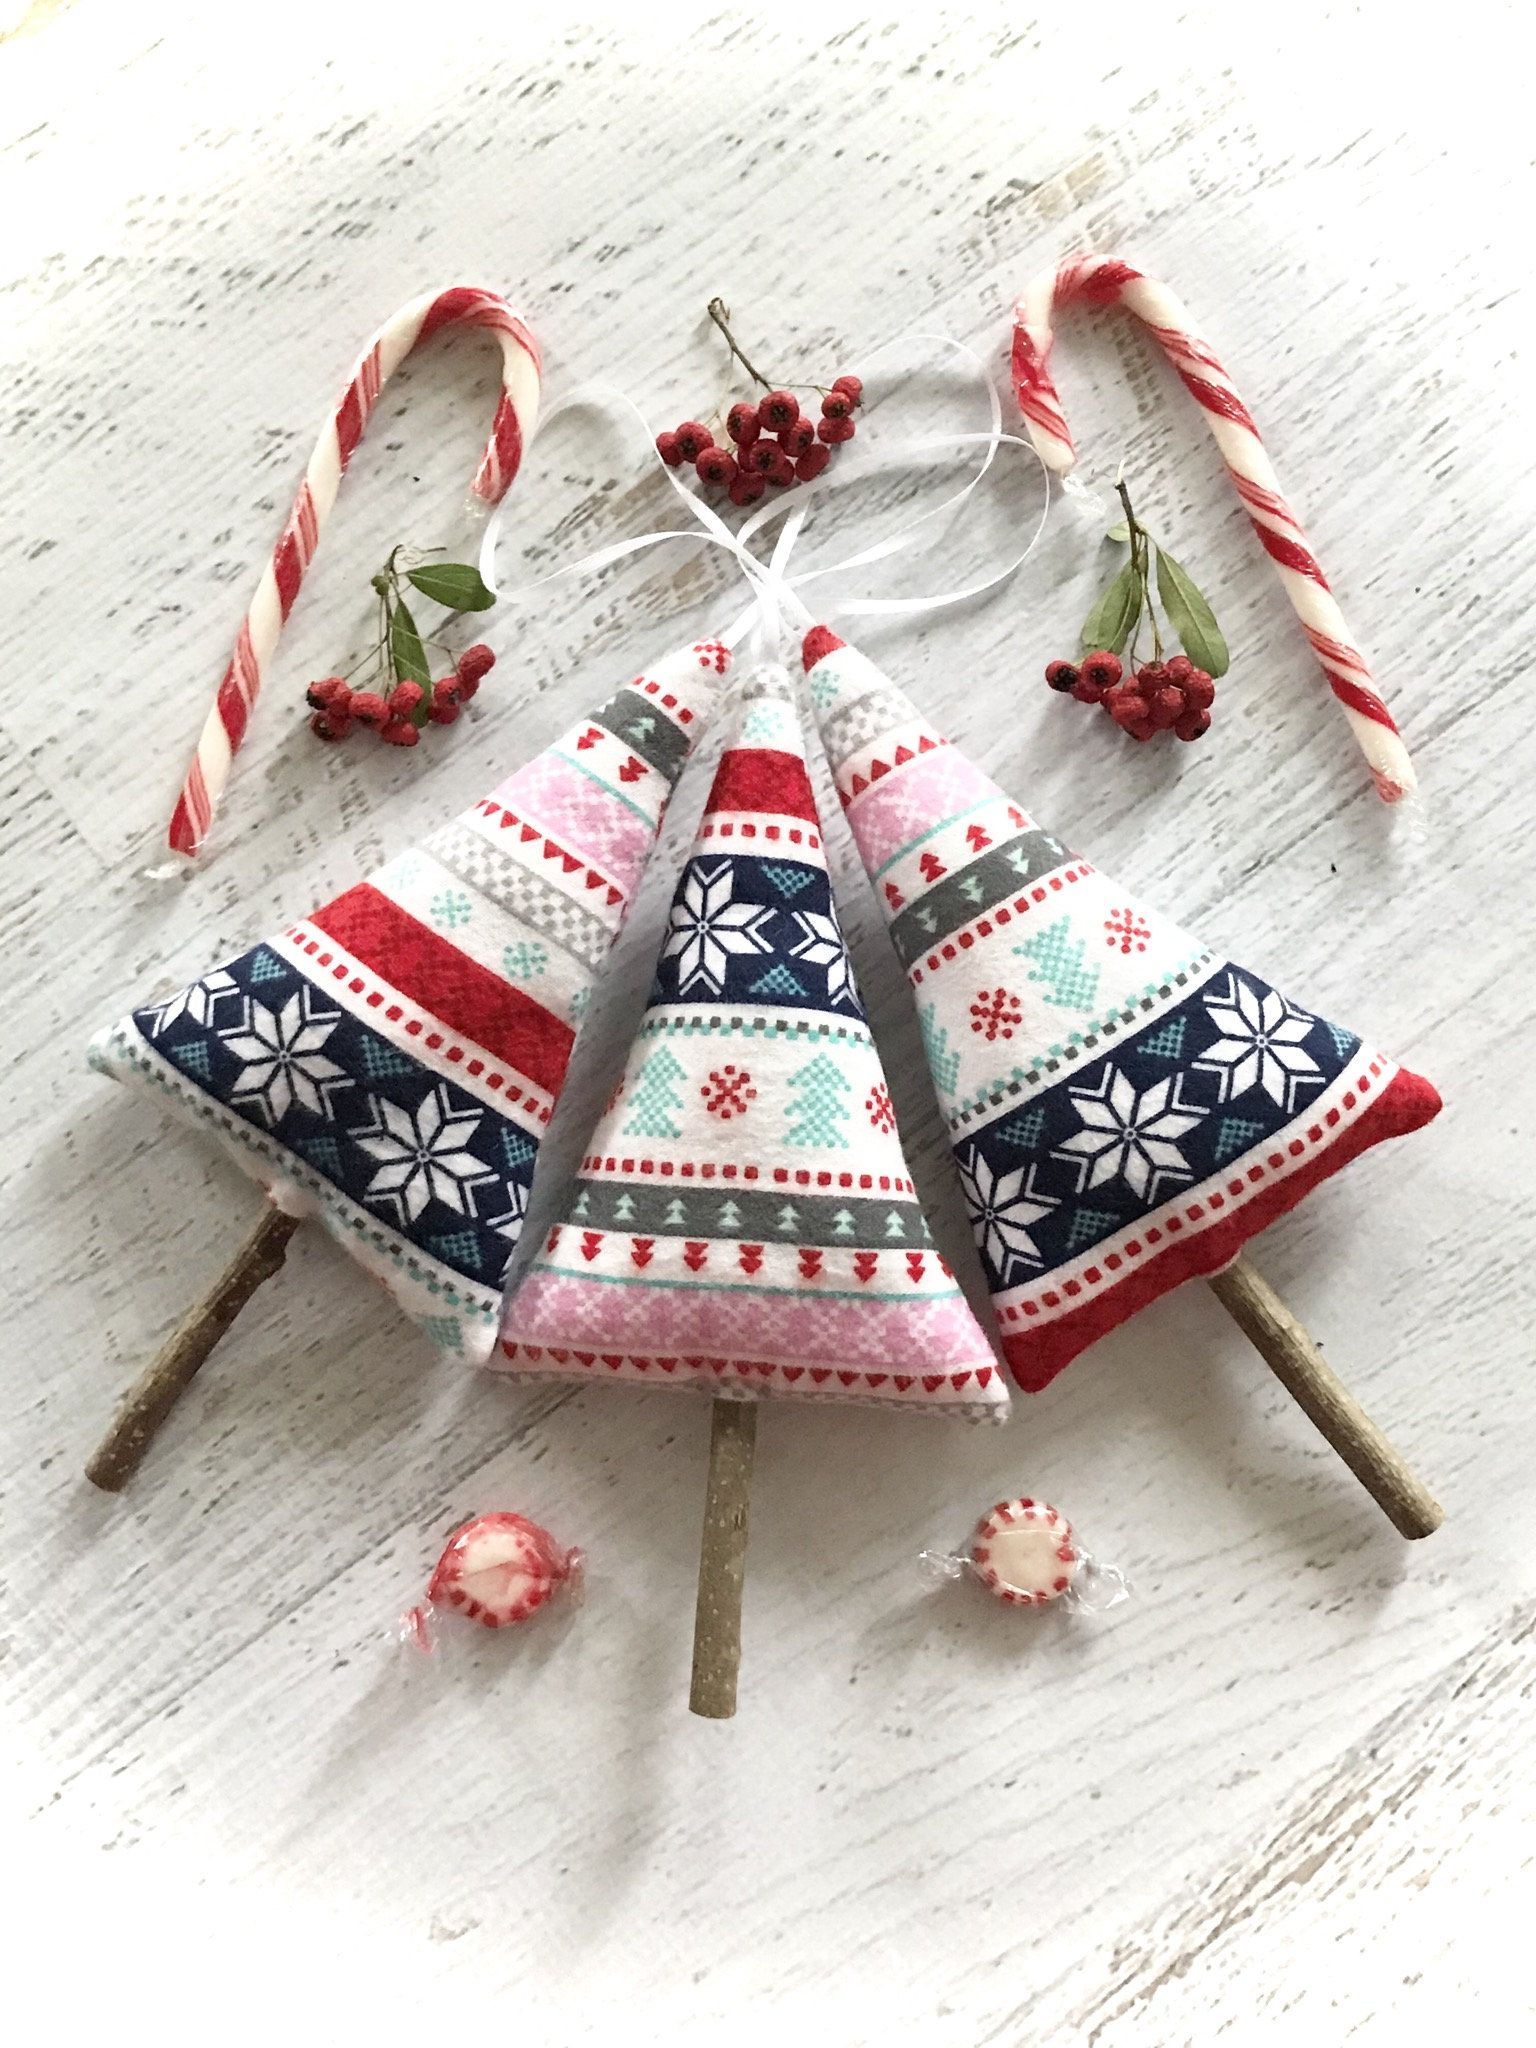 Christmas Tree Ornaments Three Plush Stuffed Fabric